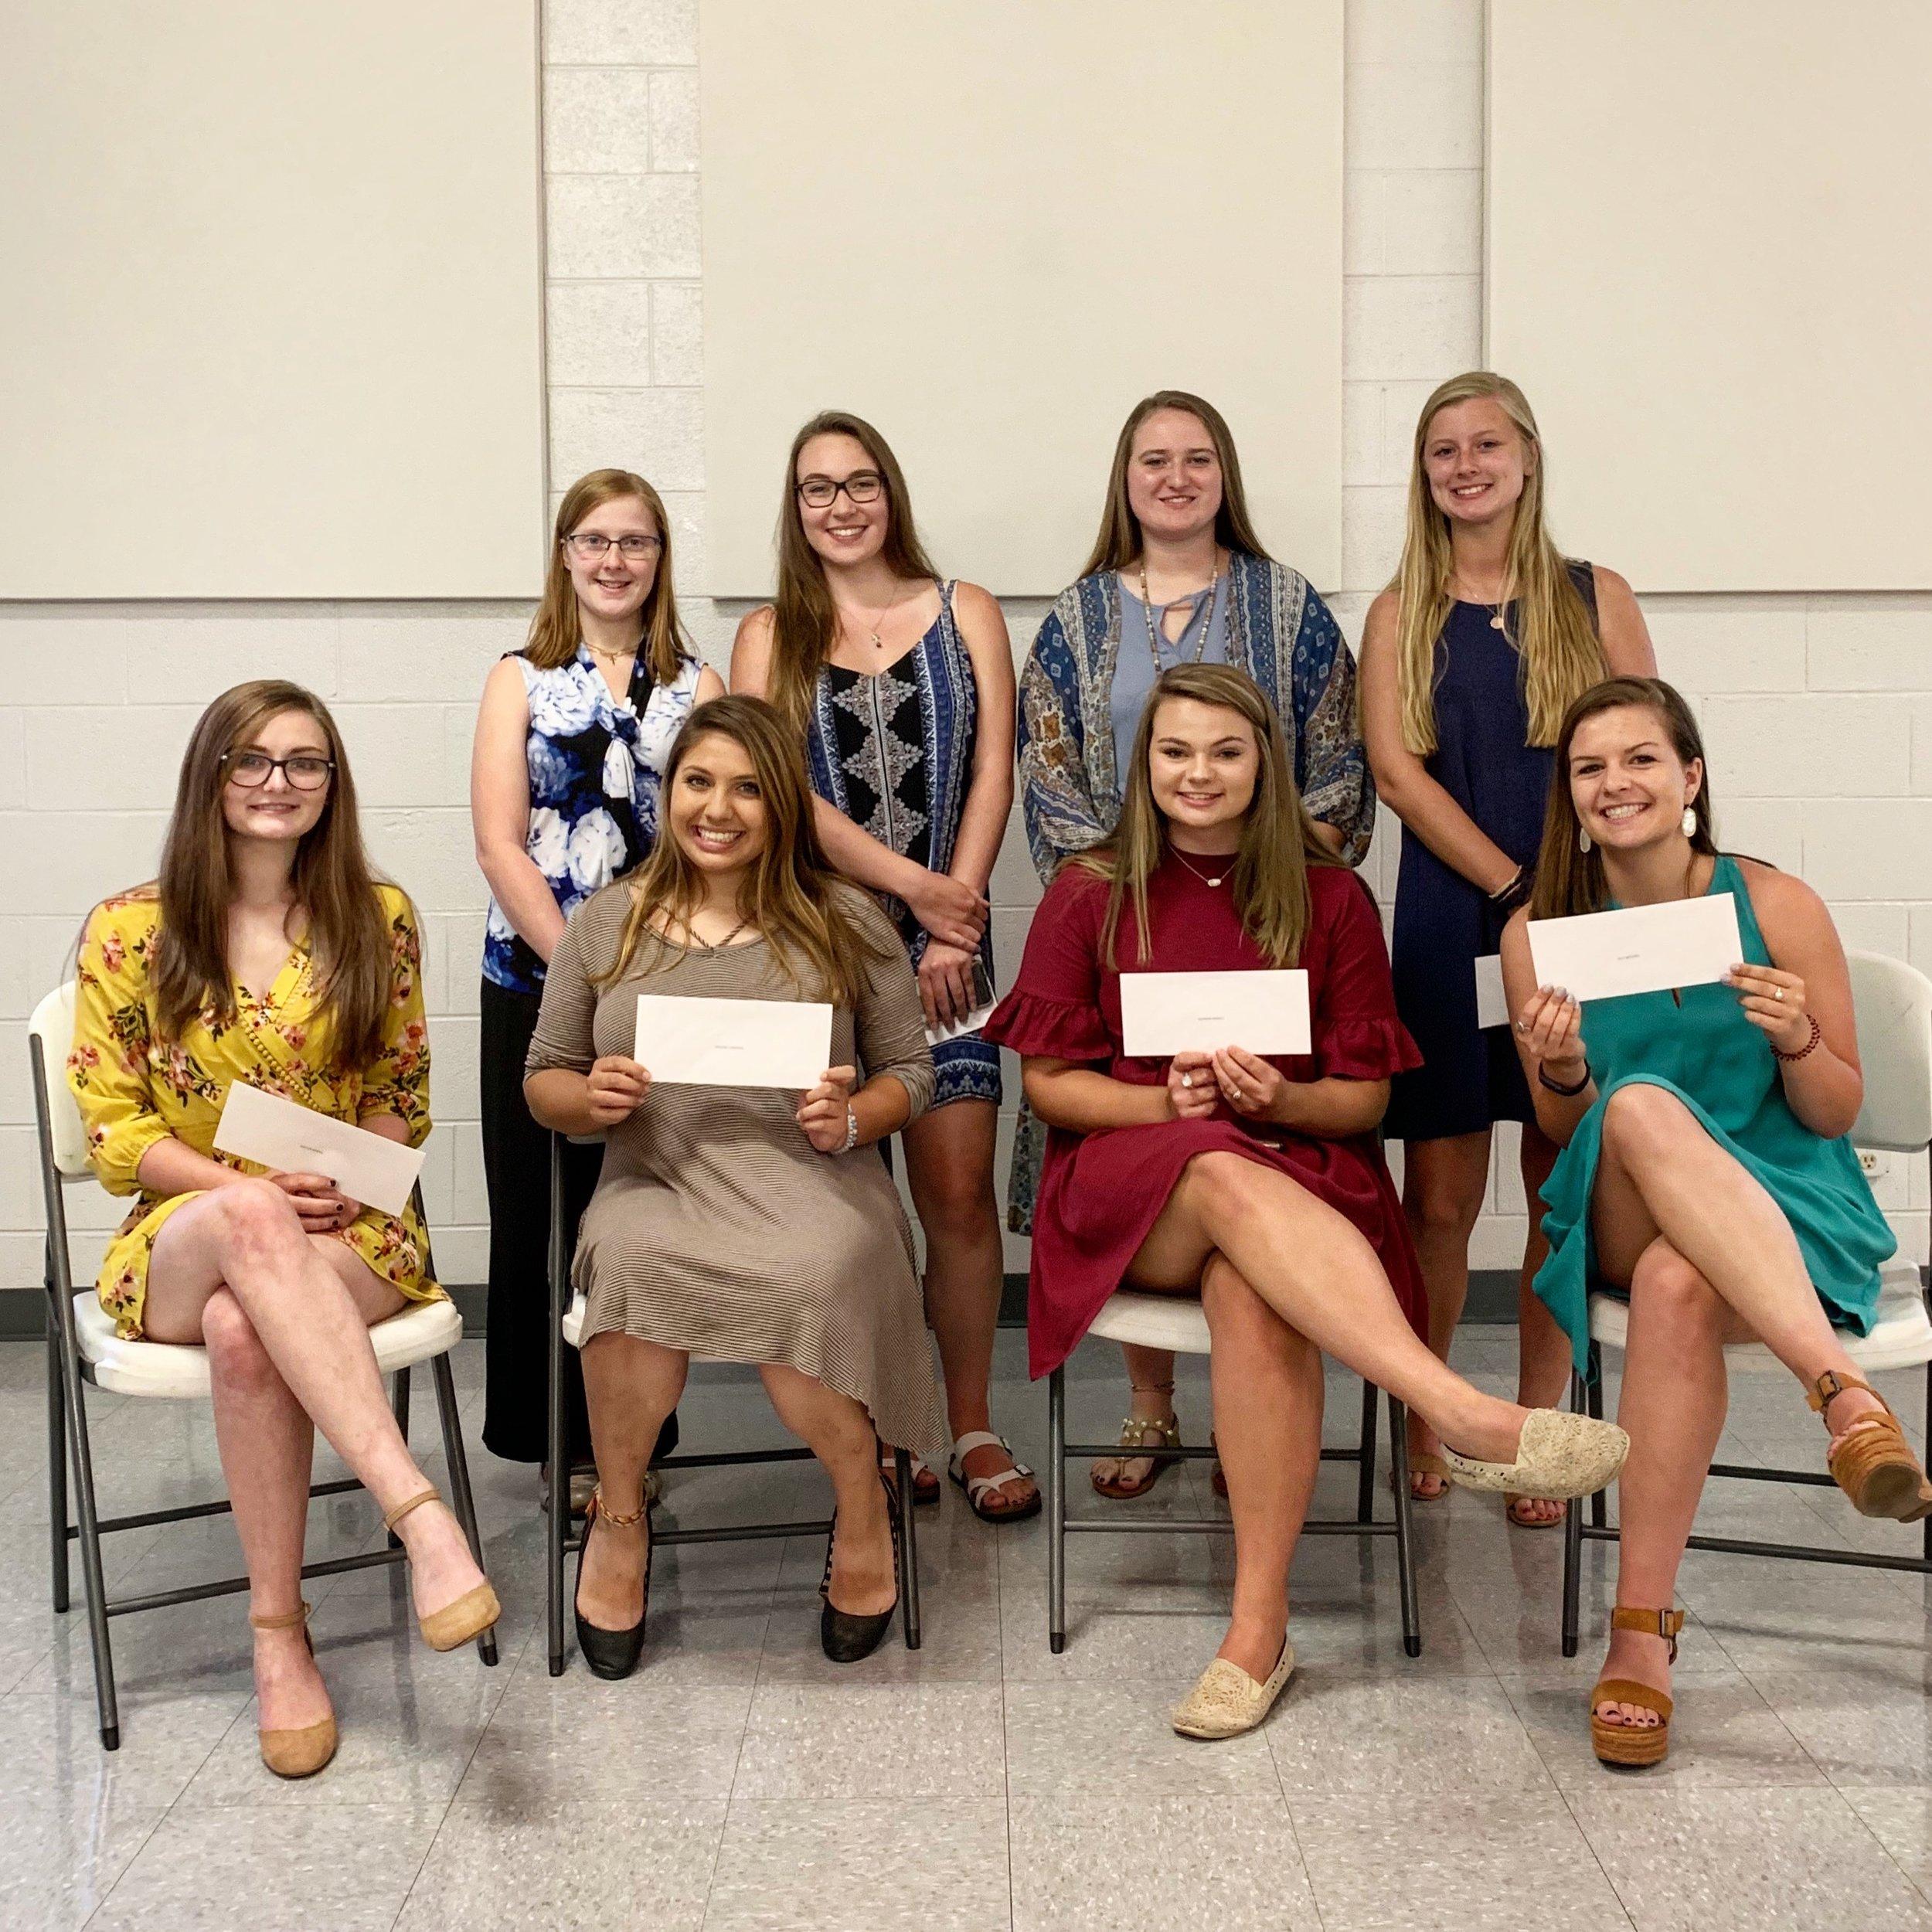 garner optimist club scholarships June 3 2019.jpg